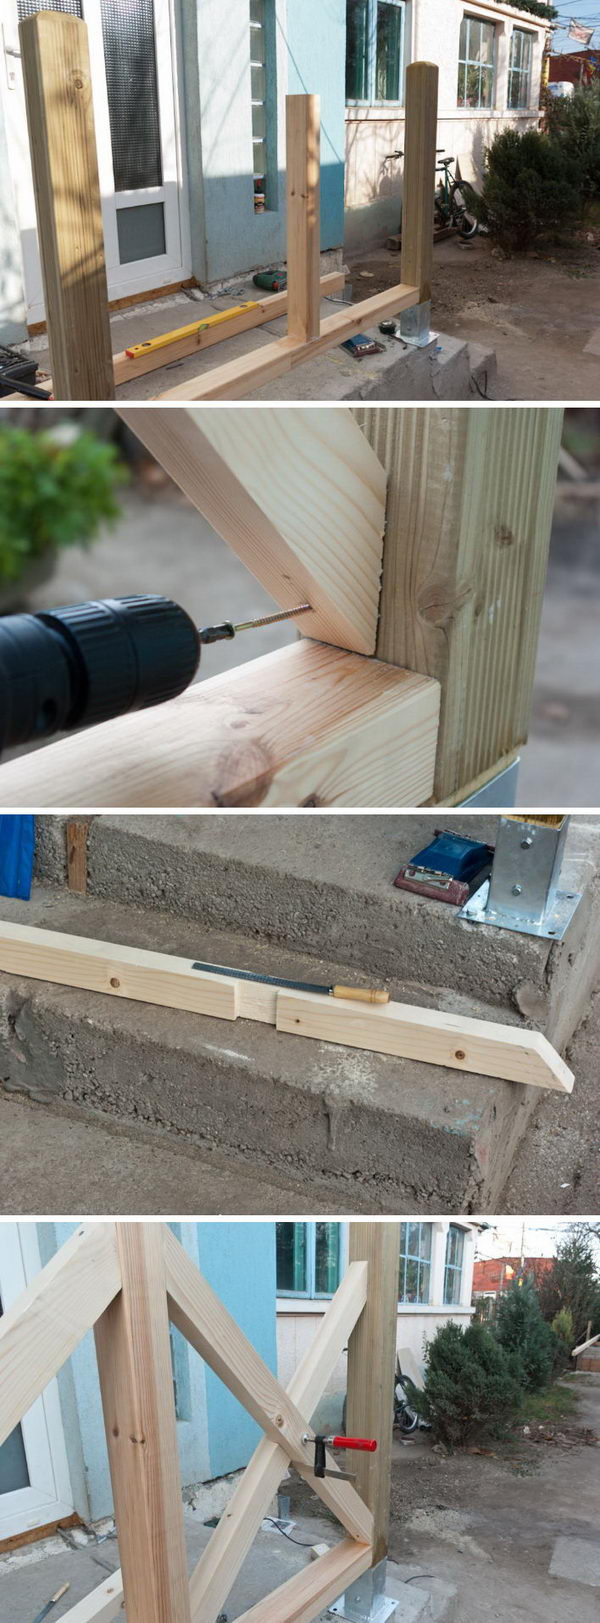 Best ideas about DIY Deck Railing Ideas . Save or Pin 20 DIY Deck Railing Ideas 2017 Now.